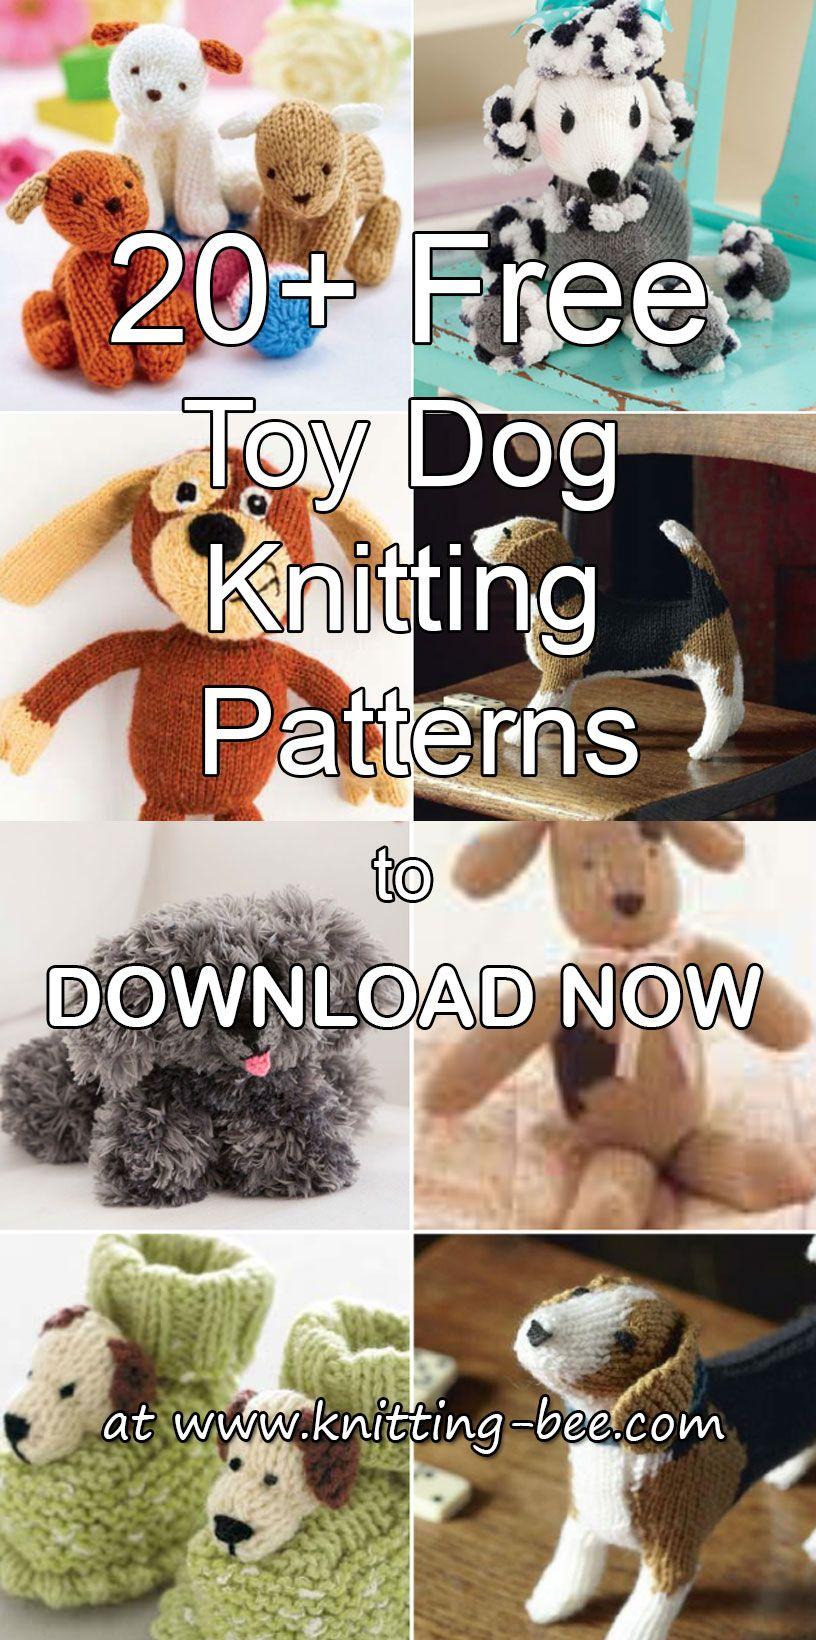 More than 20 free toy dog knitting patterns to download now http more than 20 free toy dog knitting patterns to download now httpwww bankloansurffo Gallery